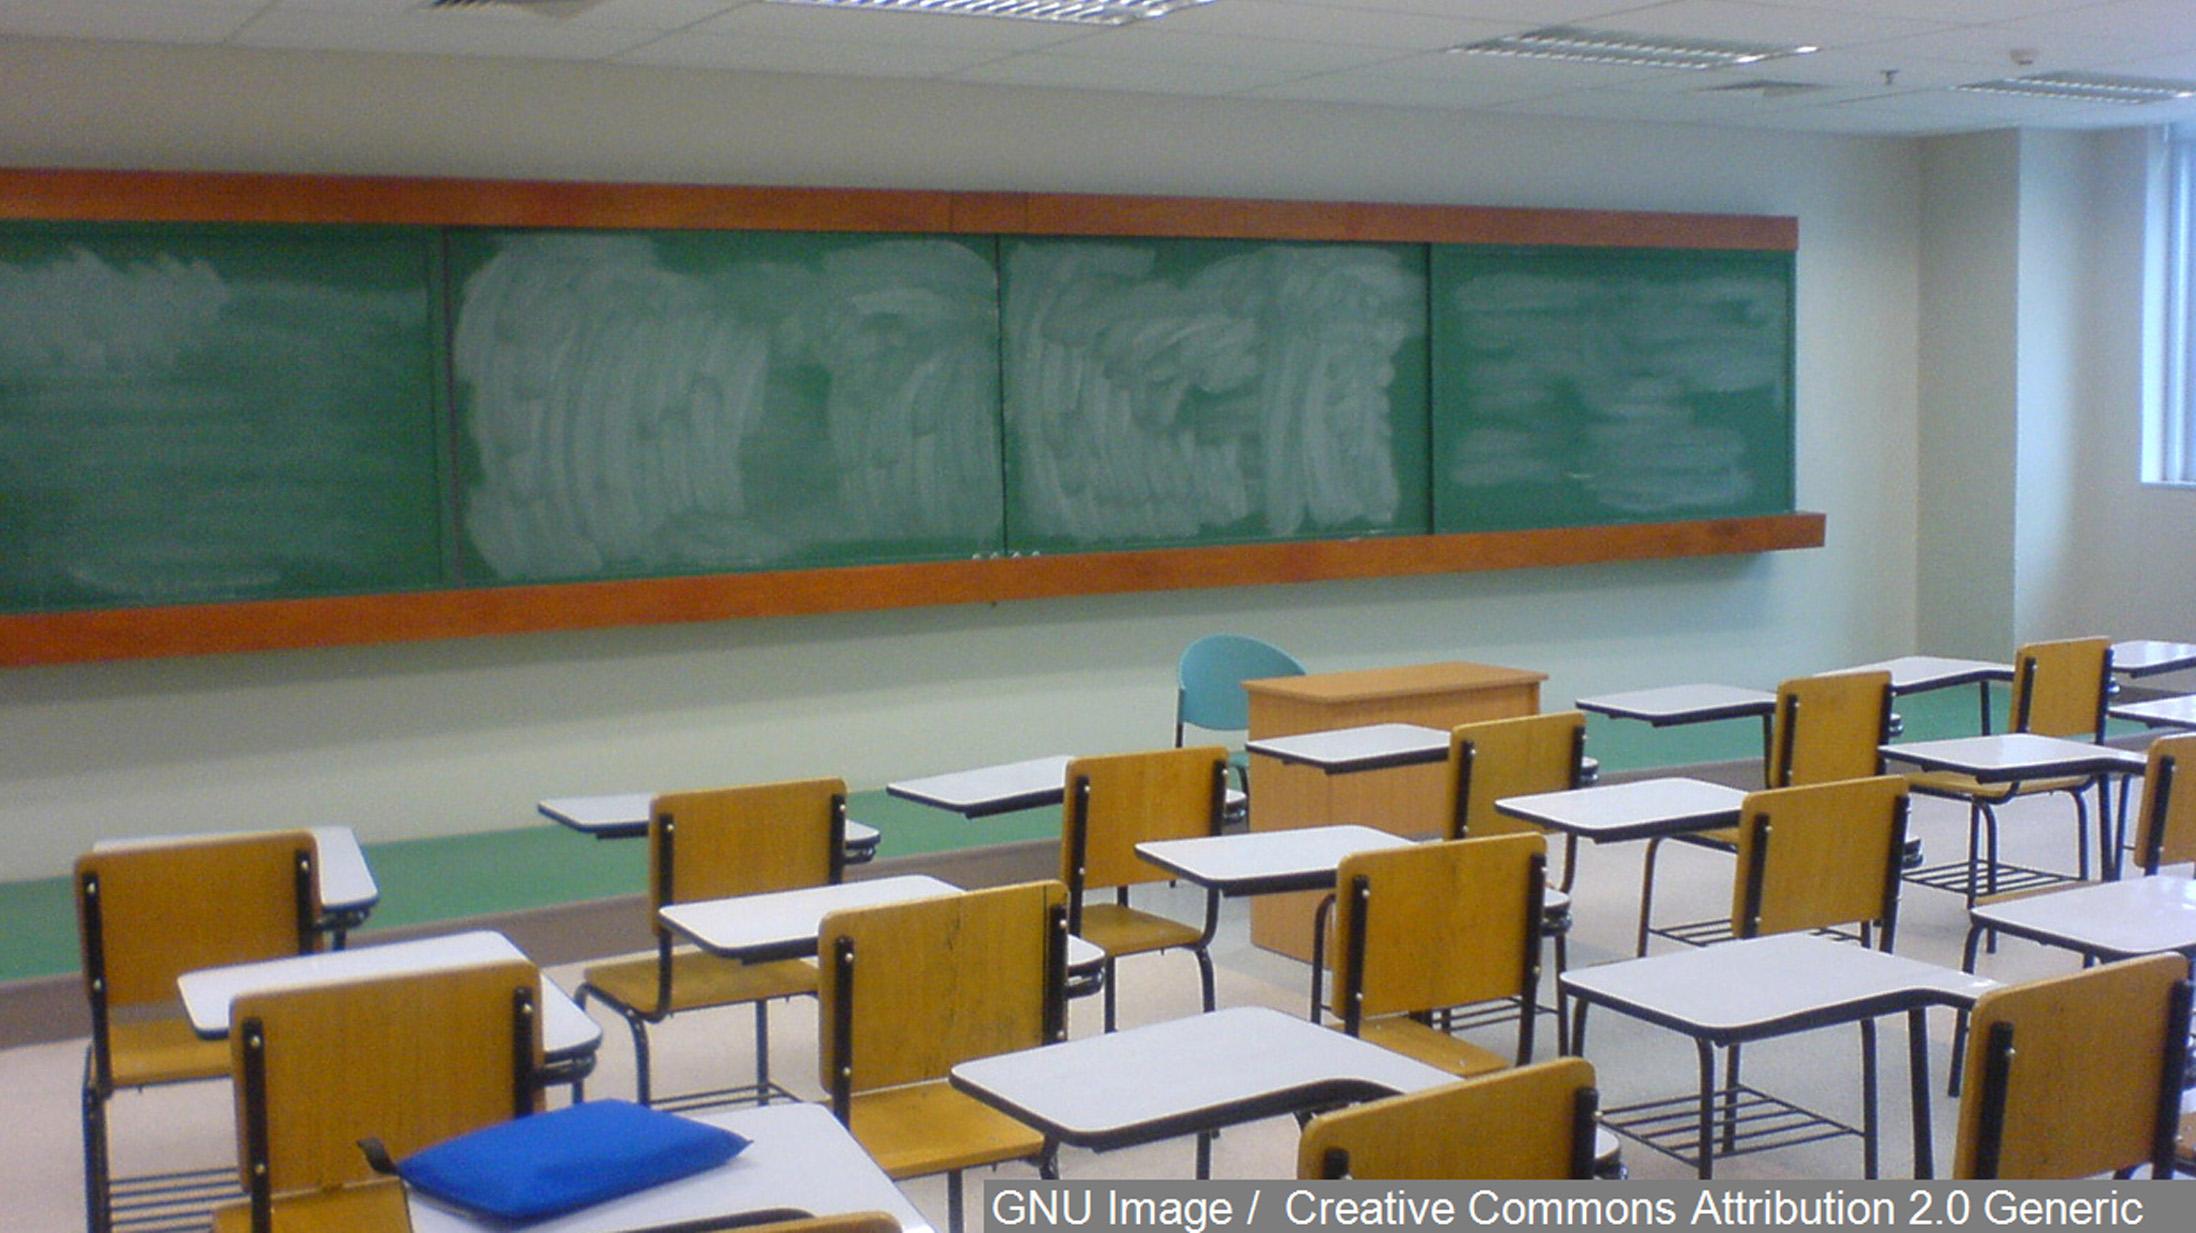 Classroom 10122015_1455594090215.jpg